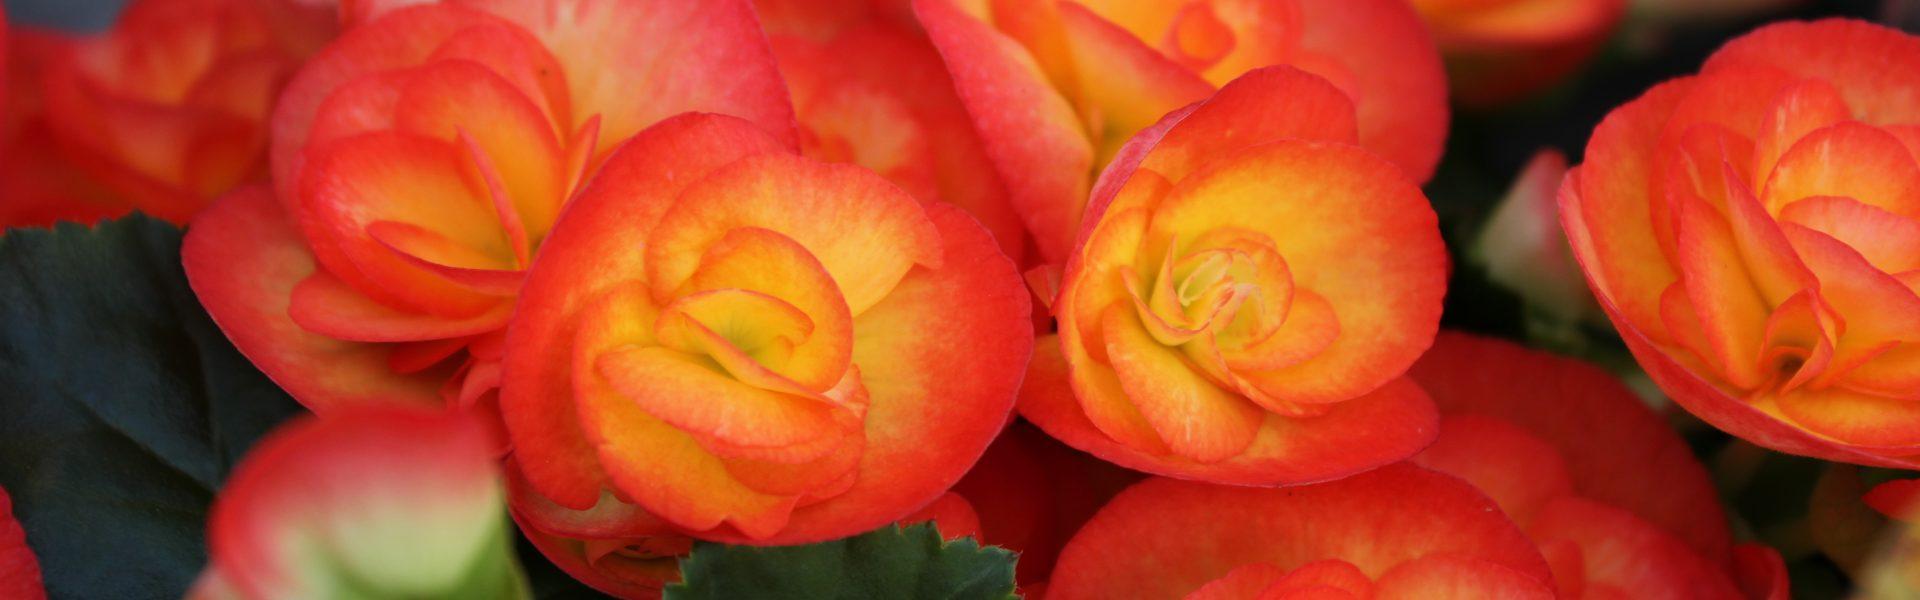 Påskestemning med blomster